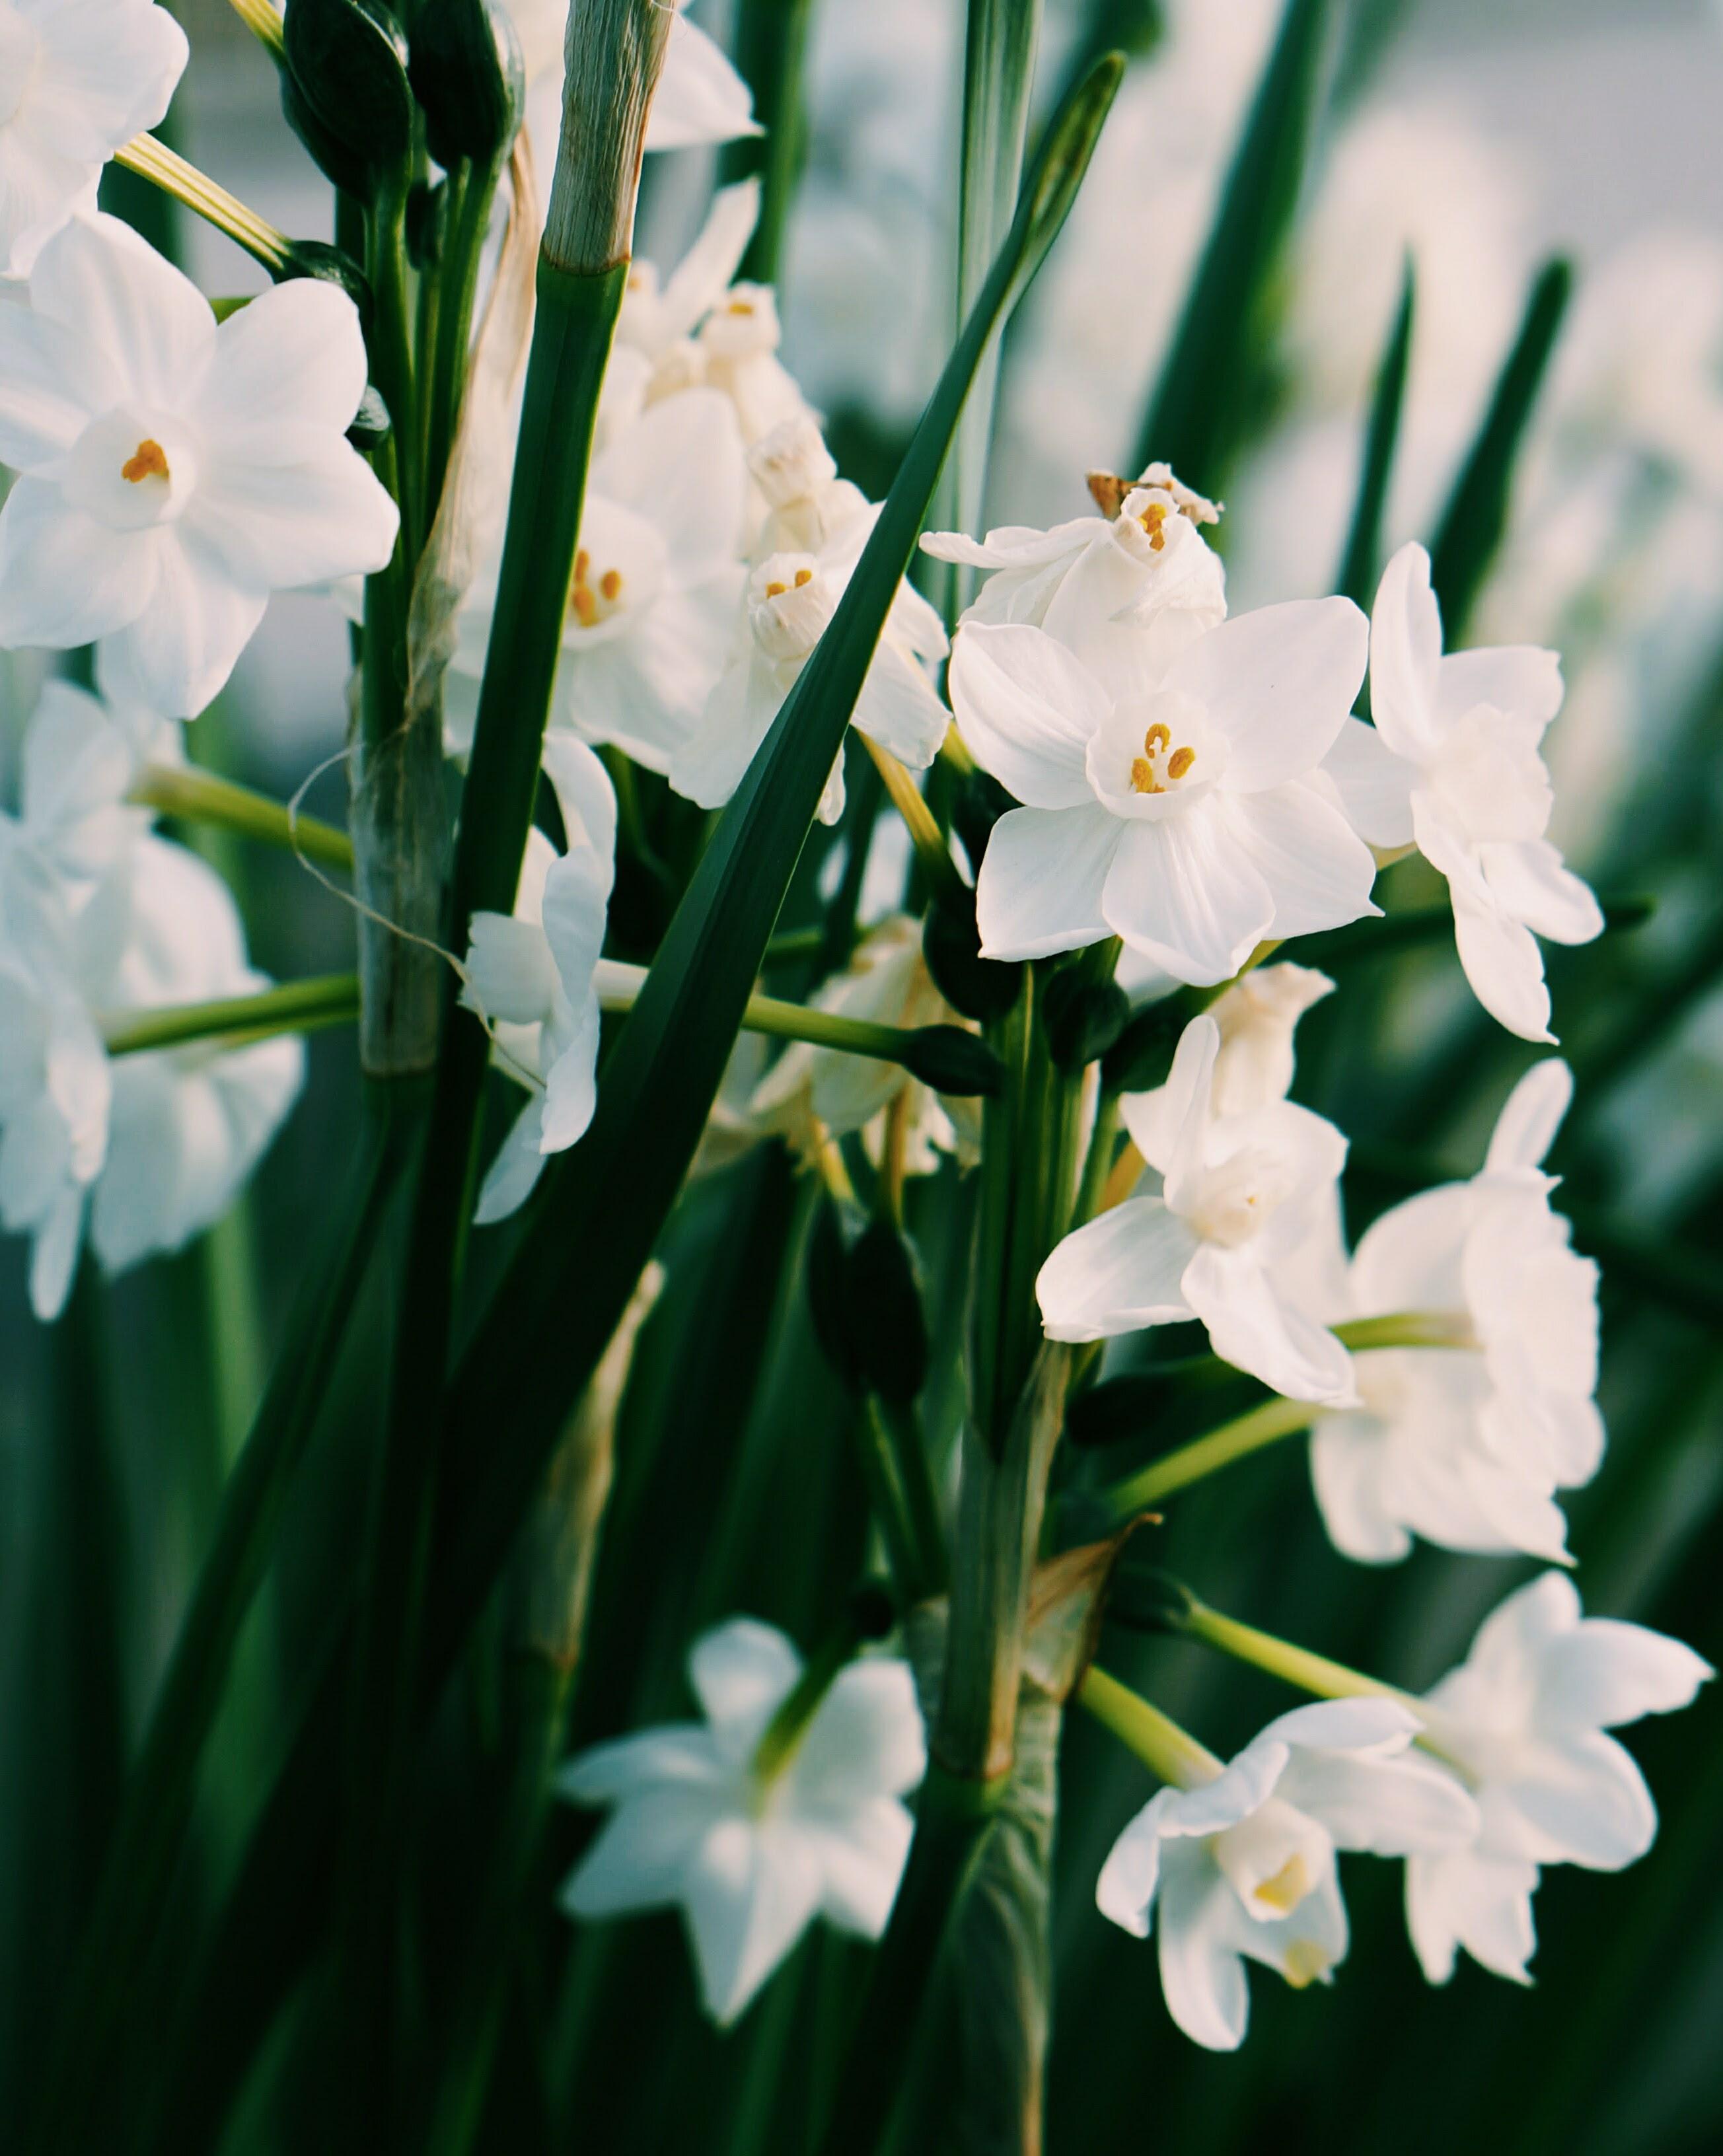 Balade fleurie aux kew gardens soyons futiles for Jardin botanique hiver 2016